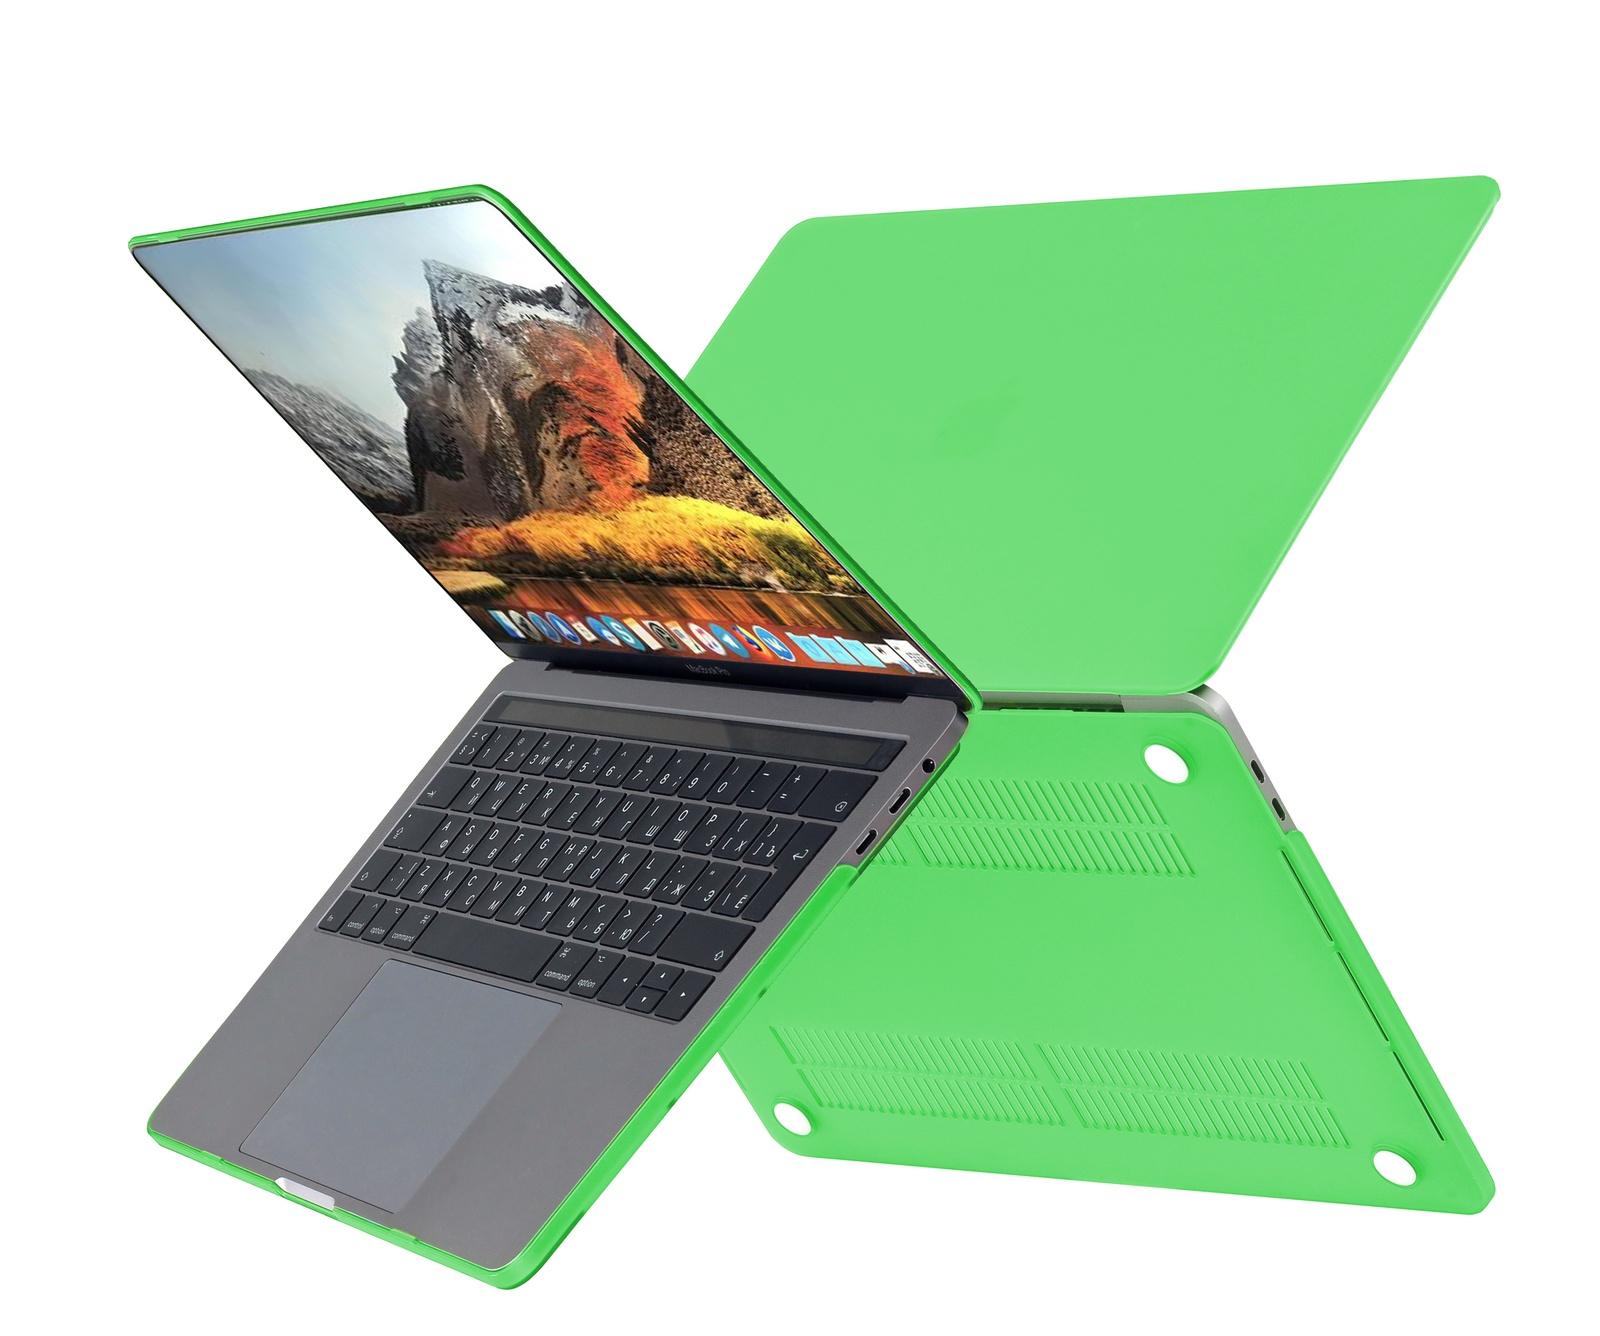 цена на Чехол HardShell Case для Macbook Pro 13 New, зеленый